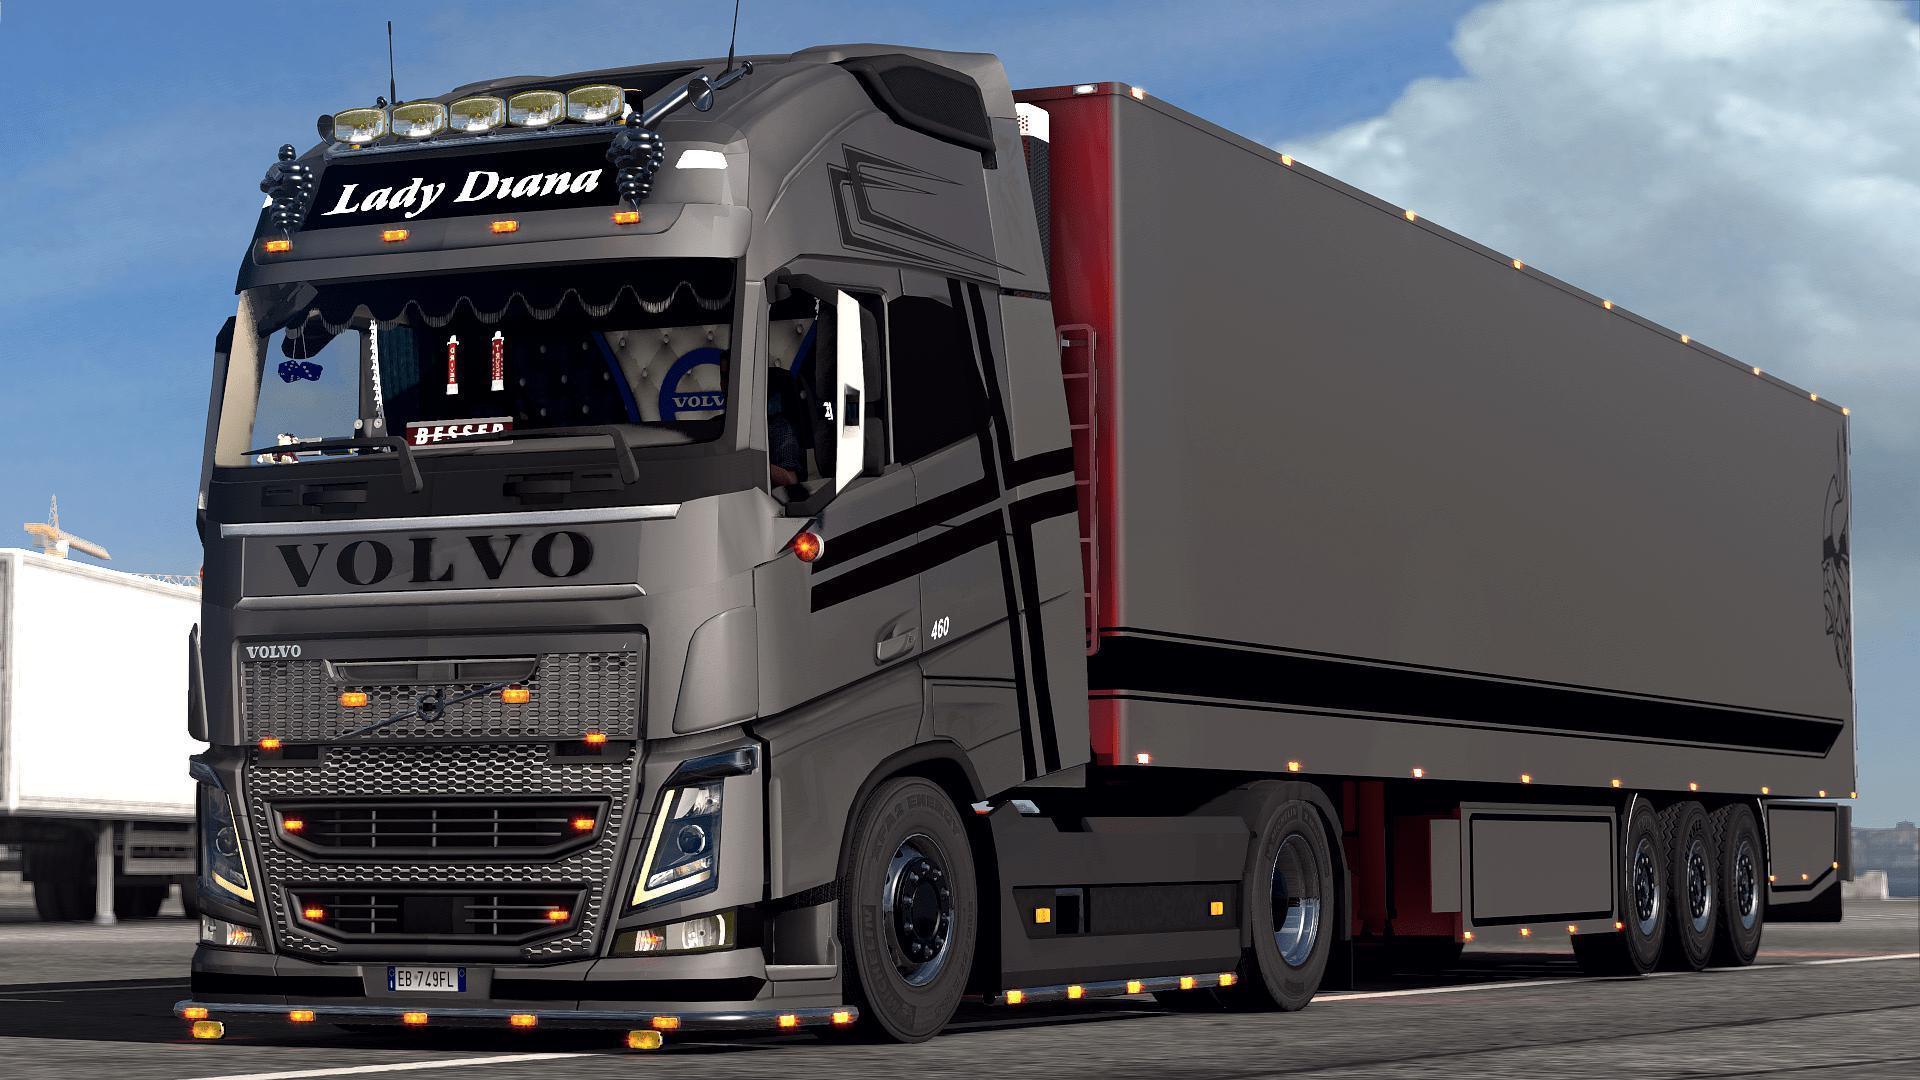 ETS2 - Volvo Lady Diana Truck (1.35.X)